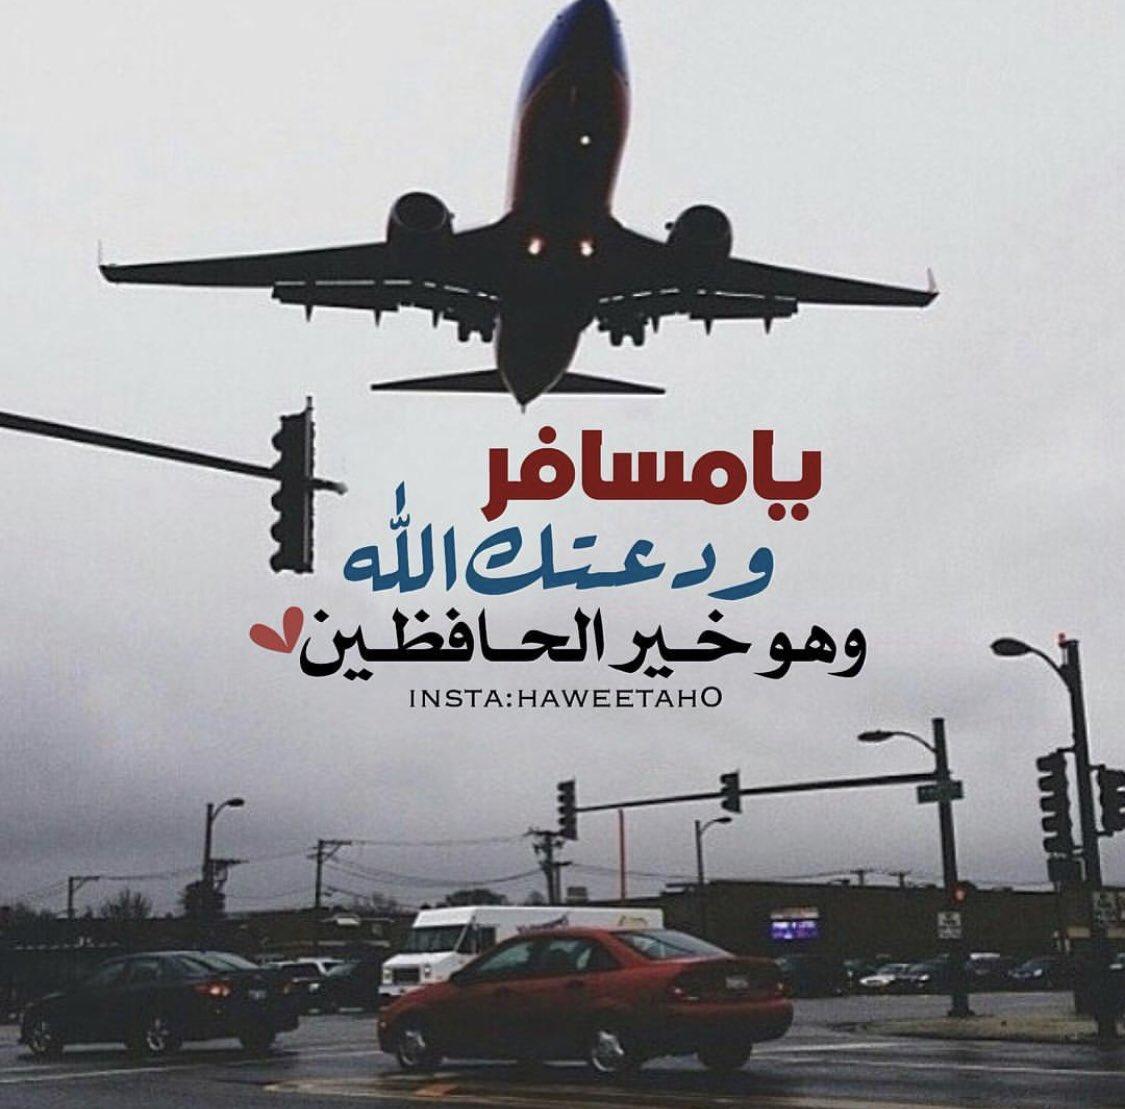 Twitter पर ودعتک الله يامسافر ह शट ग